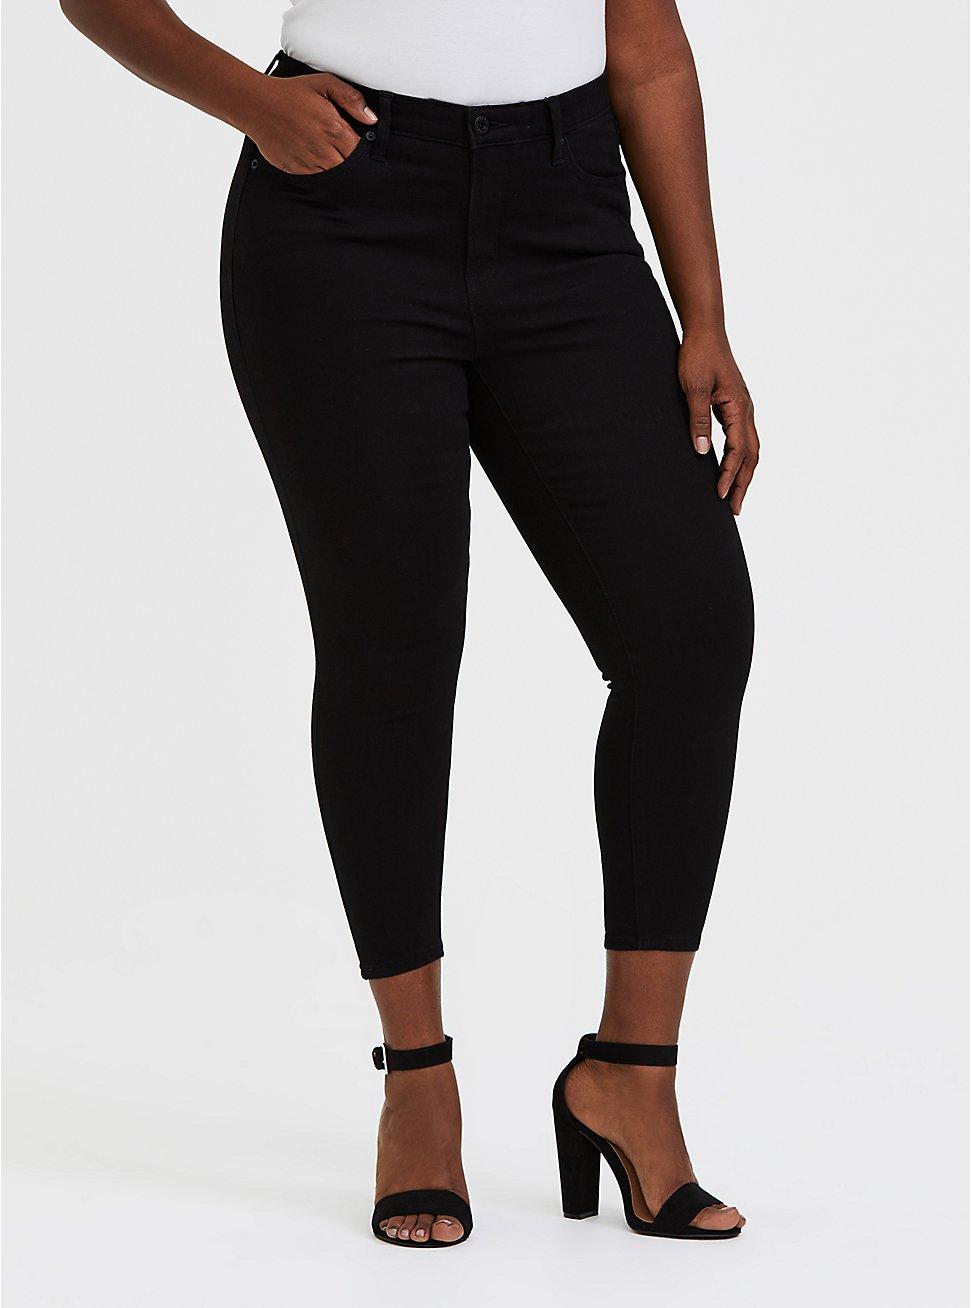 Crop Sky High Skinny Jean - Premium Stretch Black, , fitModel1-hires